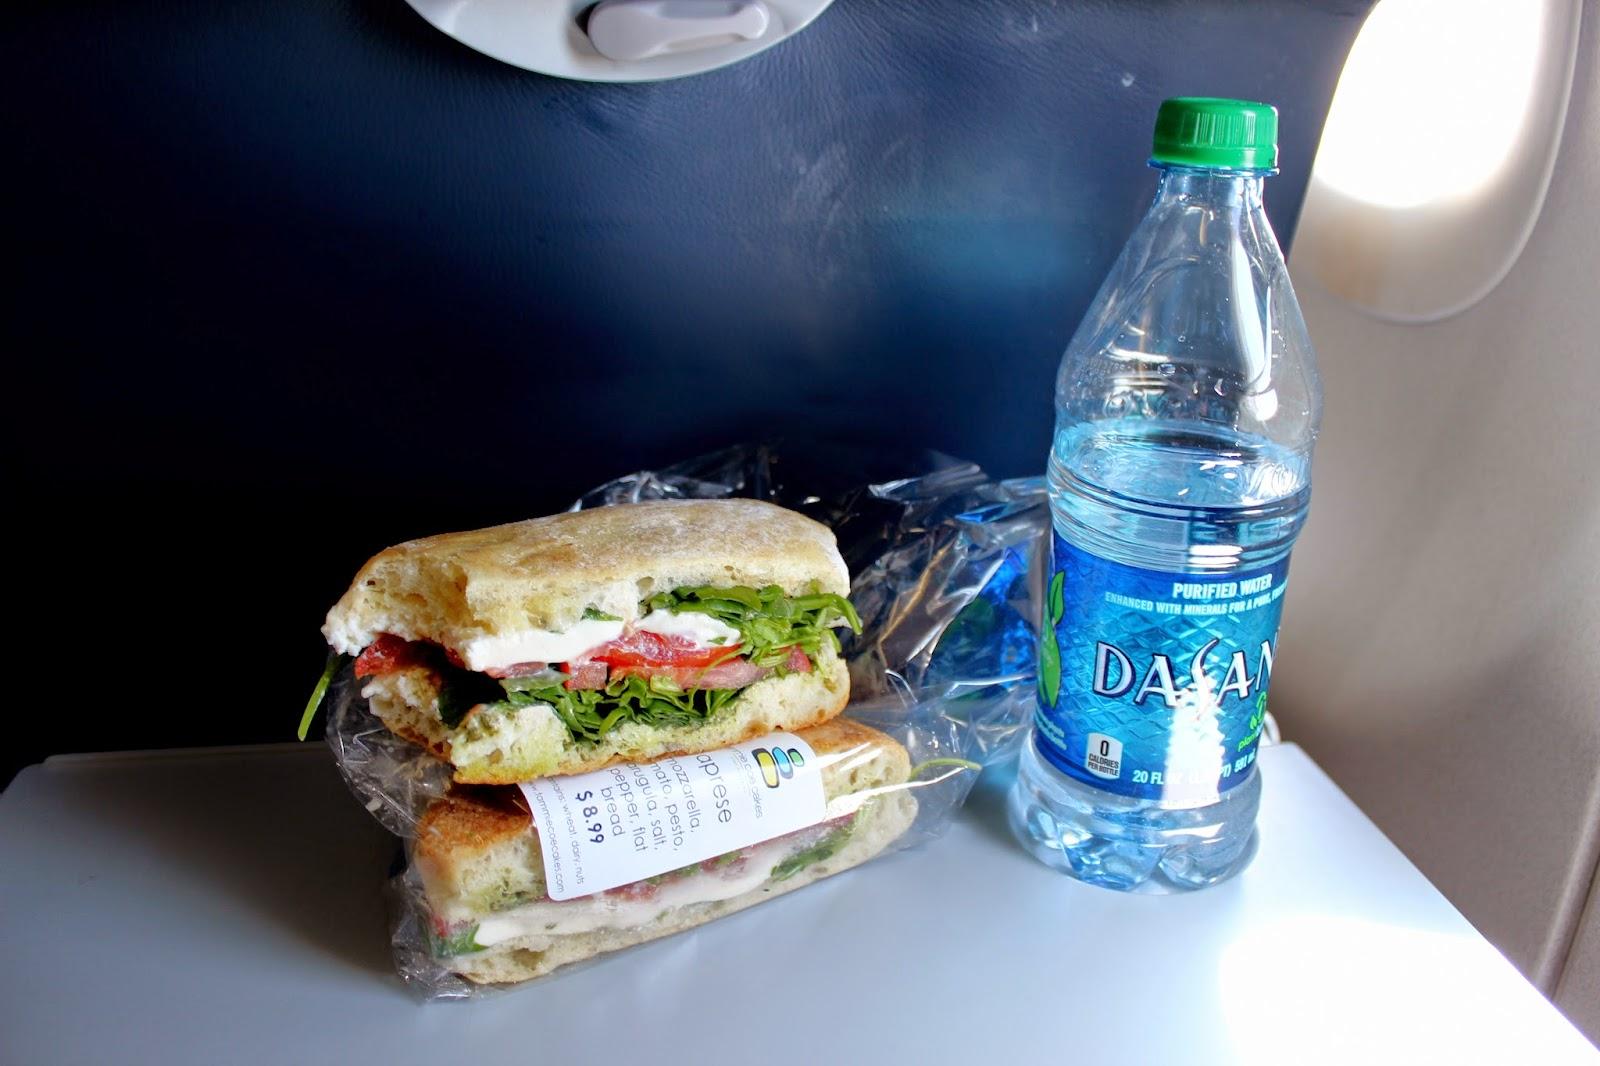 Super expensive Mozzarella Tomatoe Sandwich at the Airport Phoenix, AZ